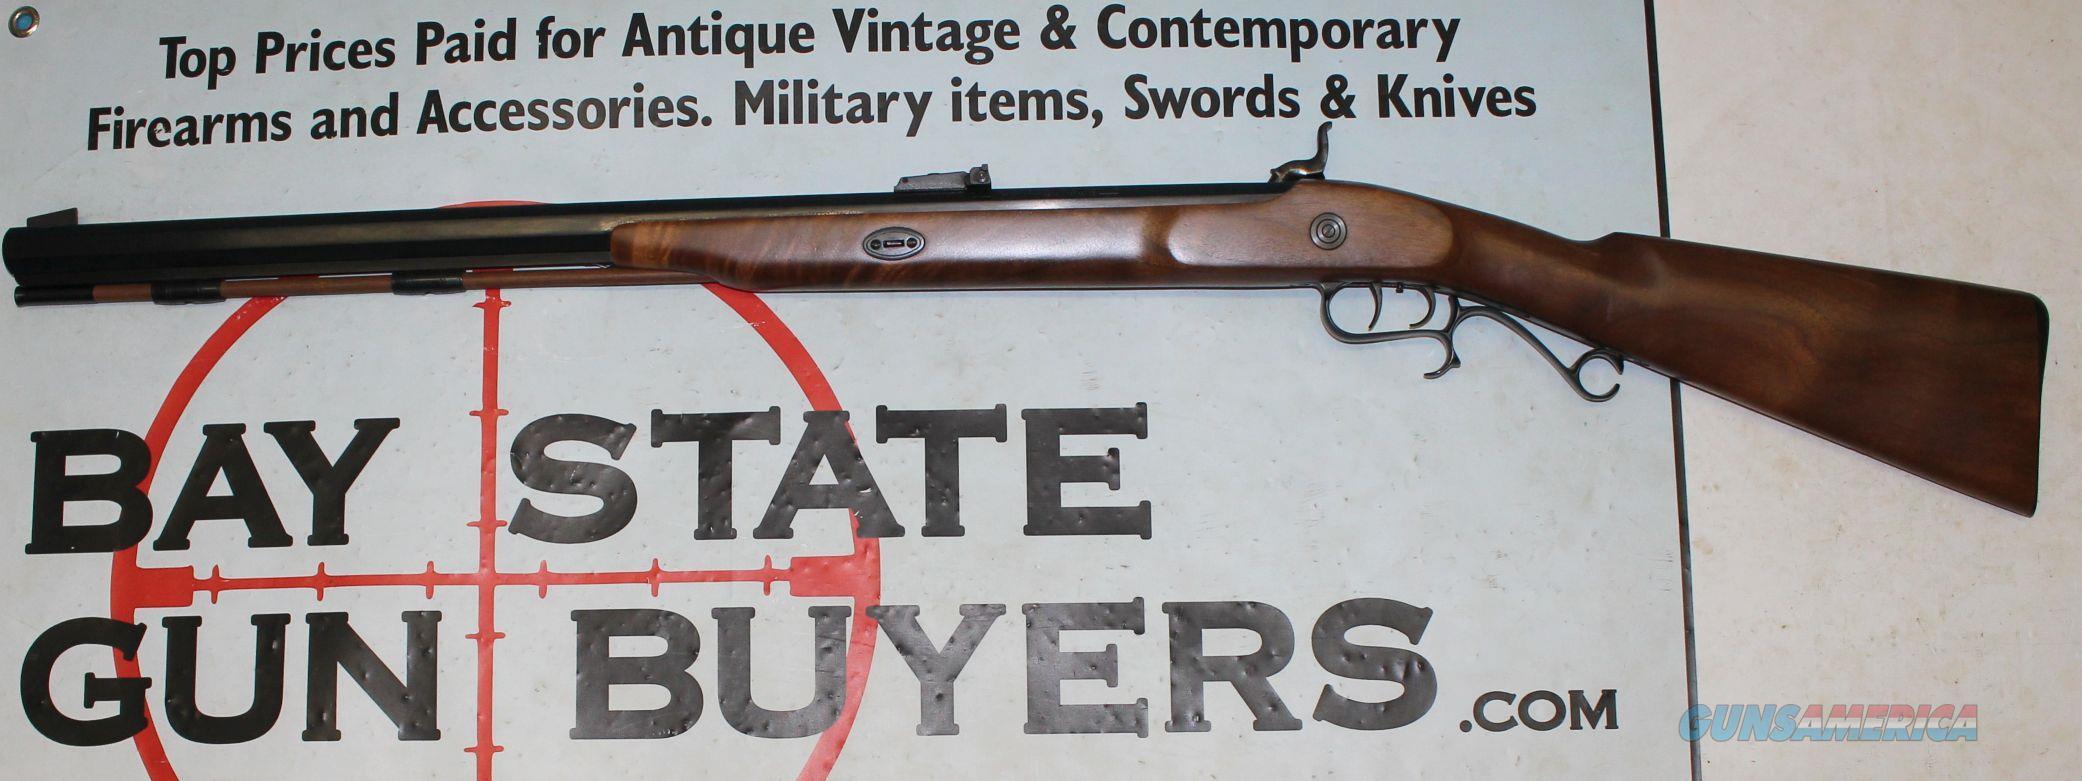 Thompson Center 56SB - 56 caliber Muzzleloader Black Powder Rifle 27